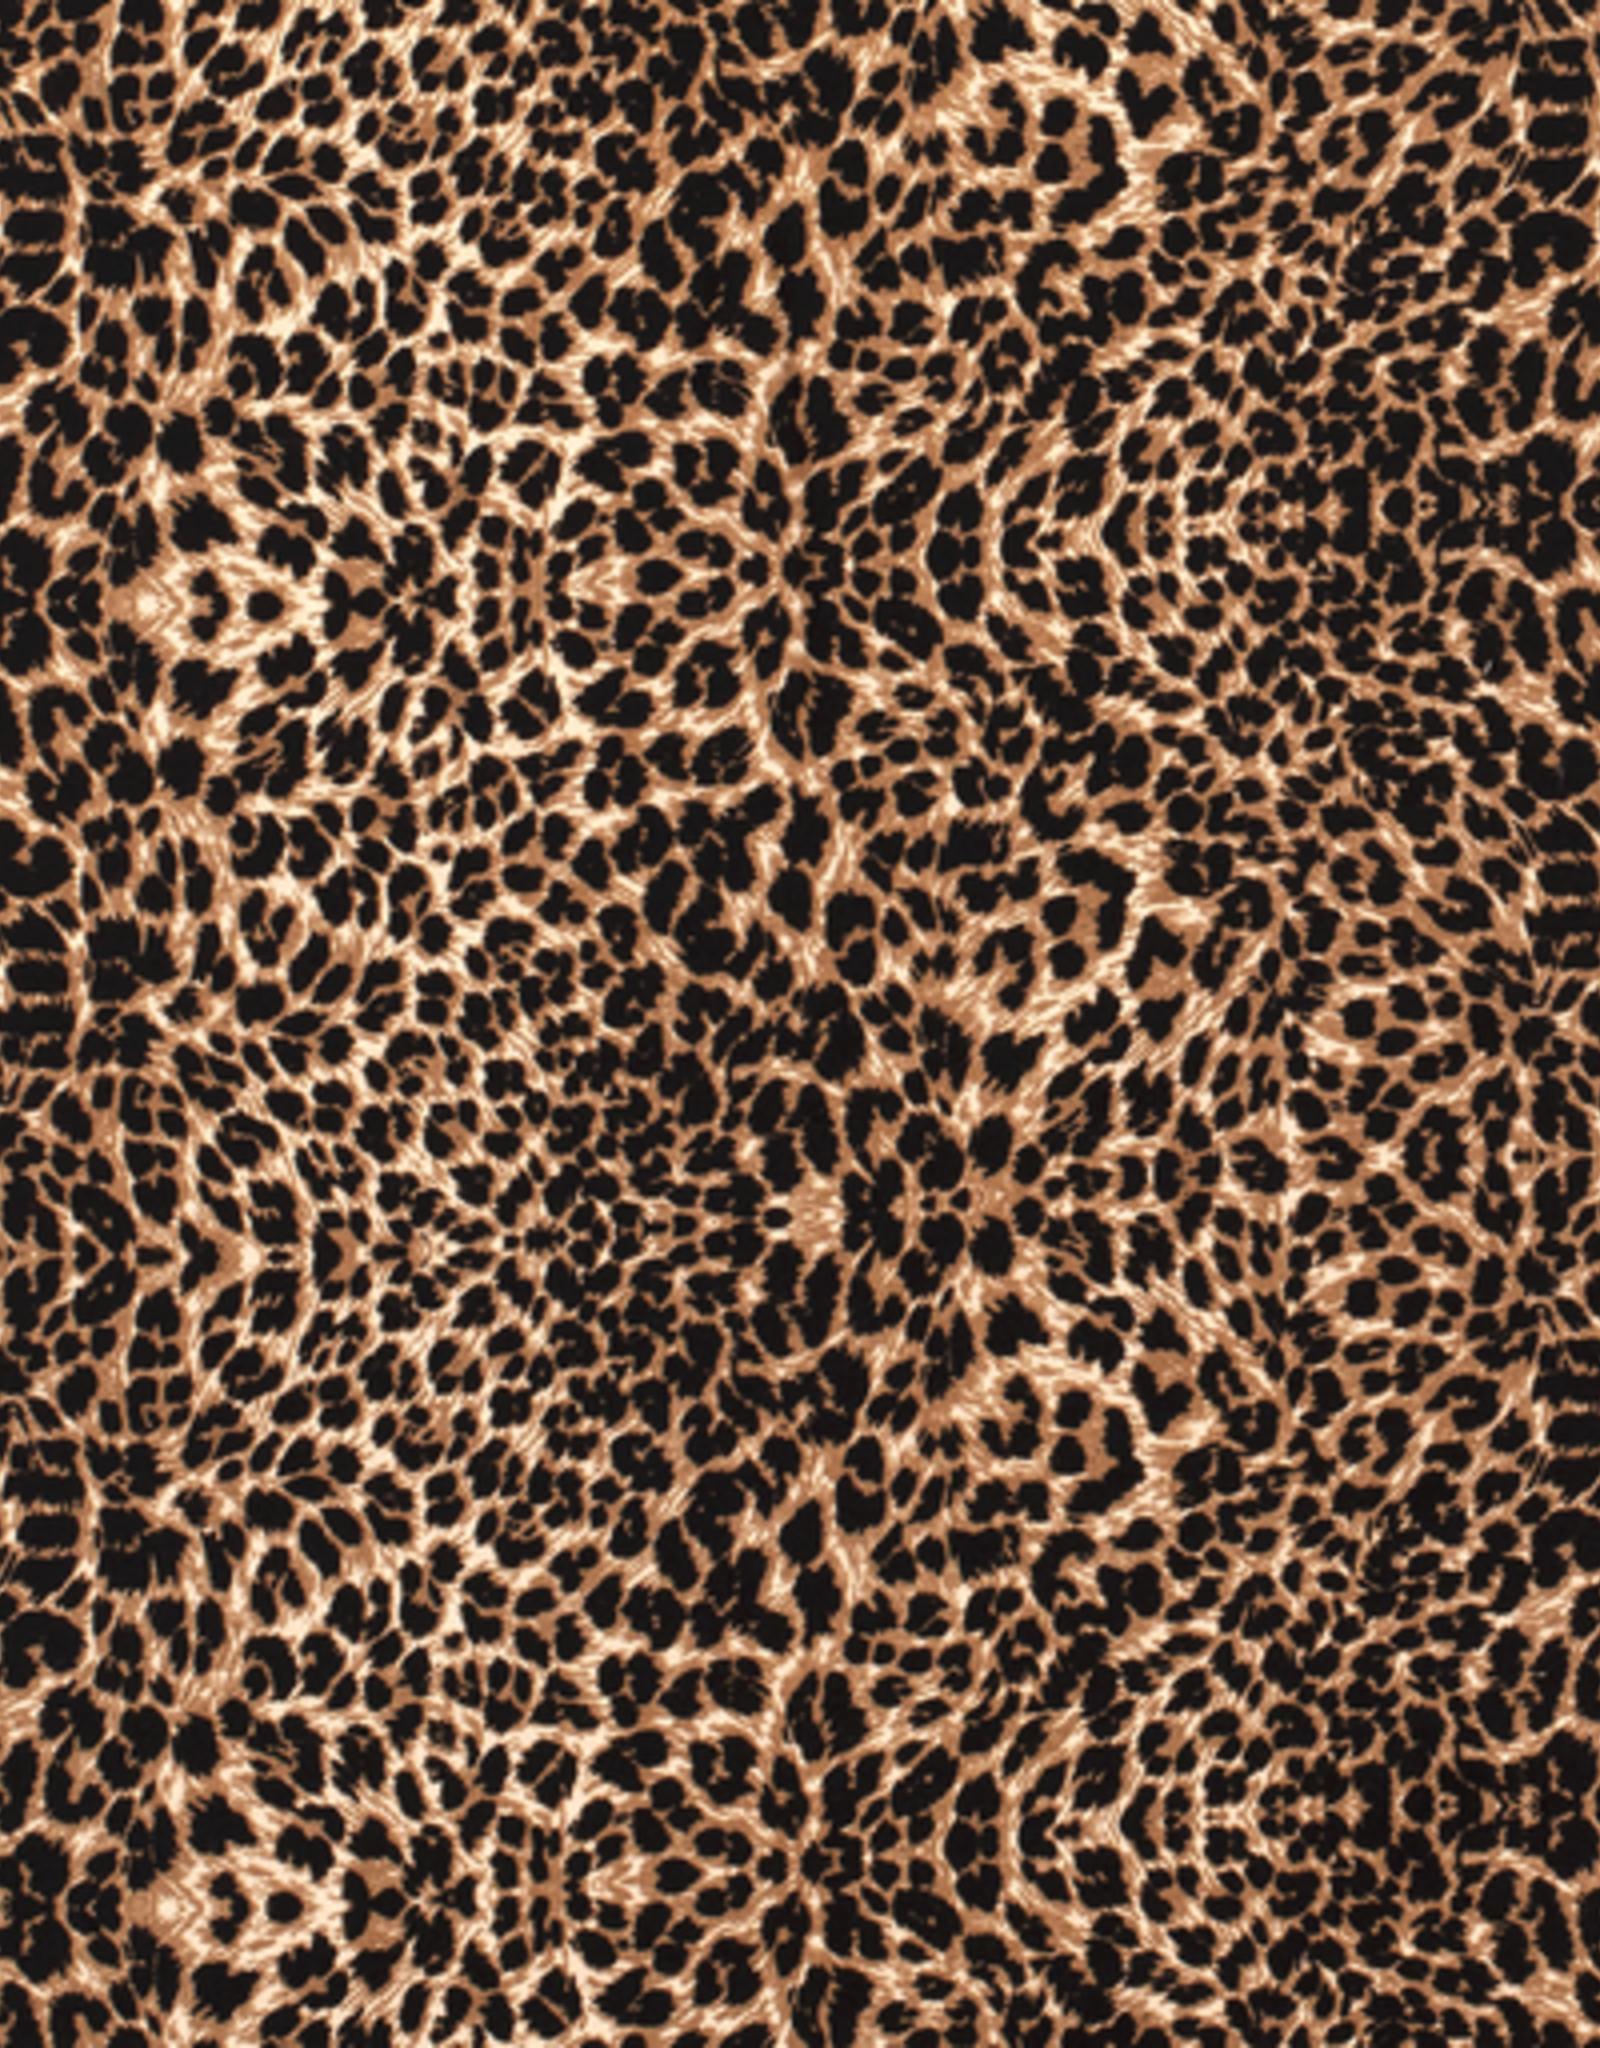 Nooteboom Bubble chiffon luipaardprint bruin gevlekt